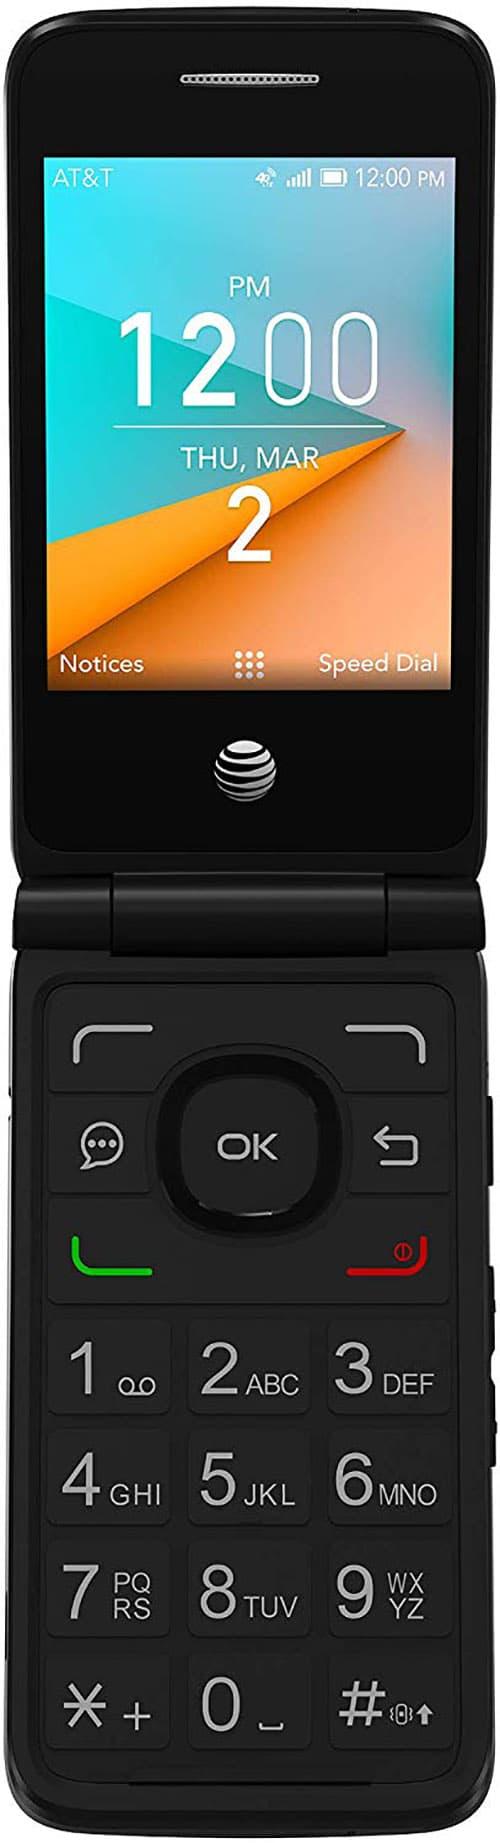 Prepaid AT&T Cingular Flip 2 - Teléfono prepago, Color Gris Oscuro, 4 GB, Gris